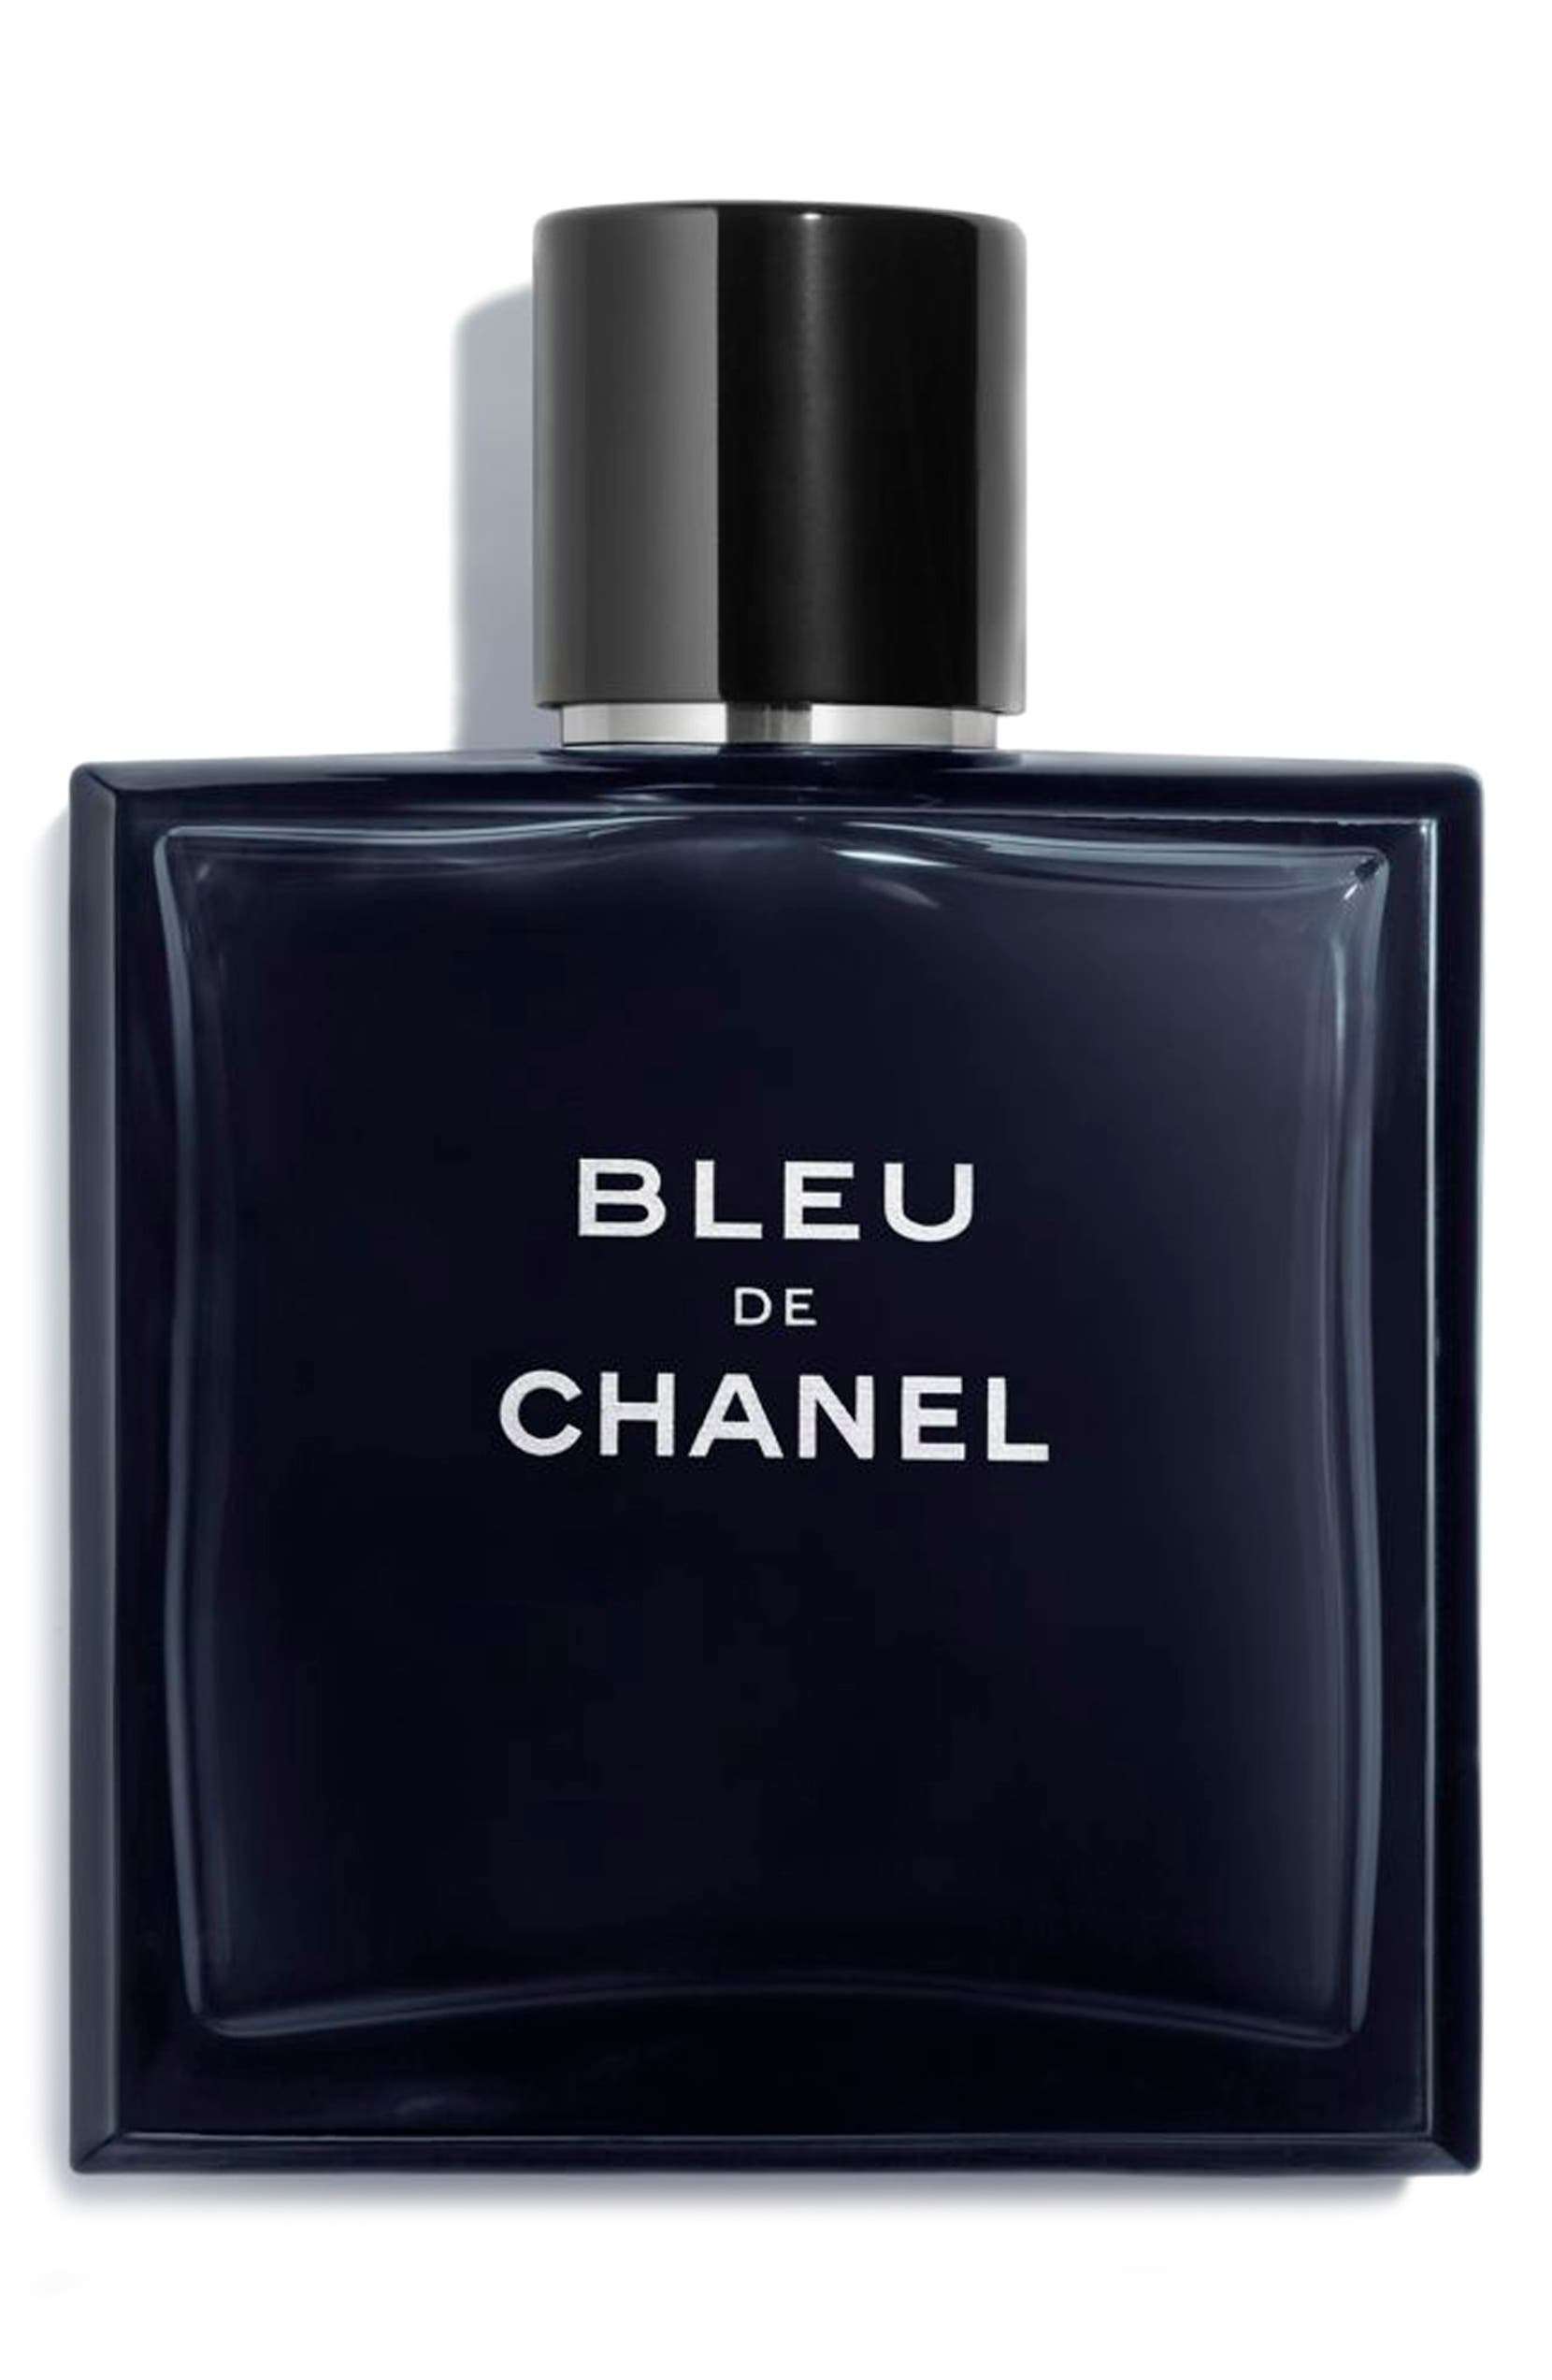 CHANEL BLEU DE CHANEL Eau de Toilette Spray  20b485b33